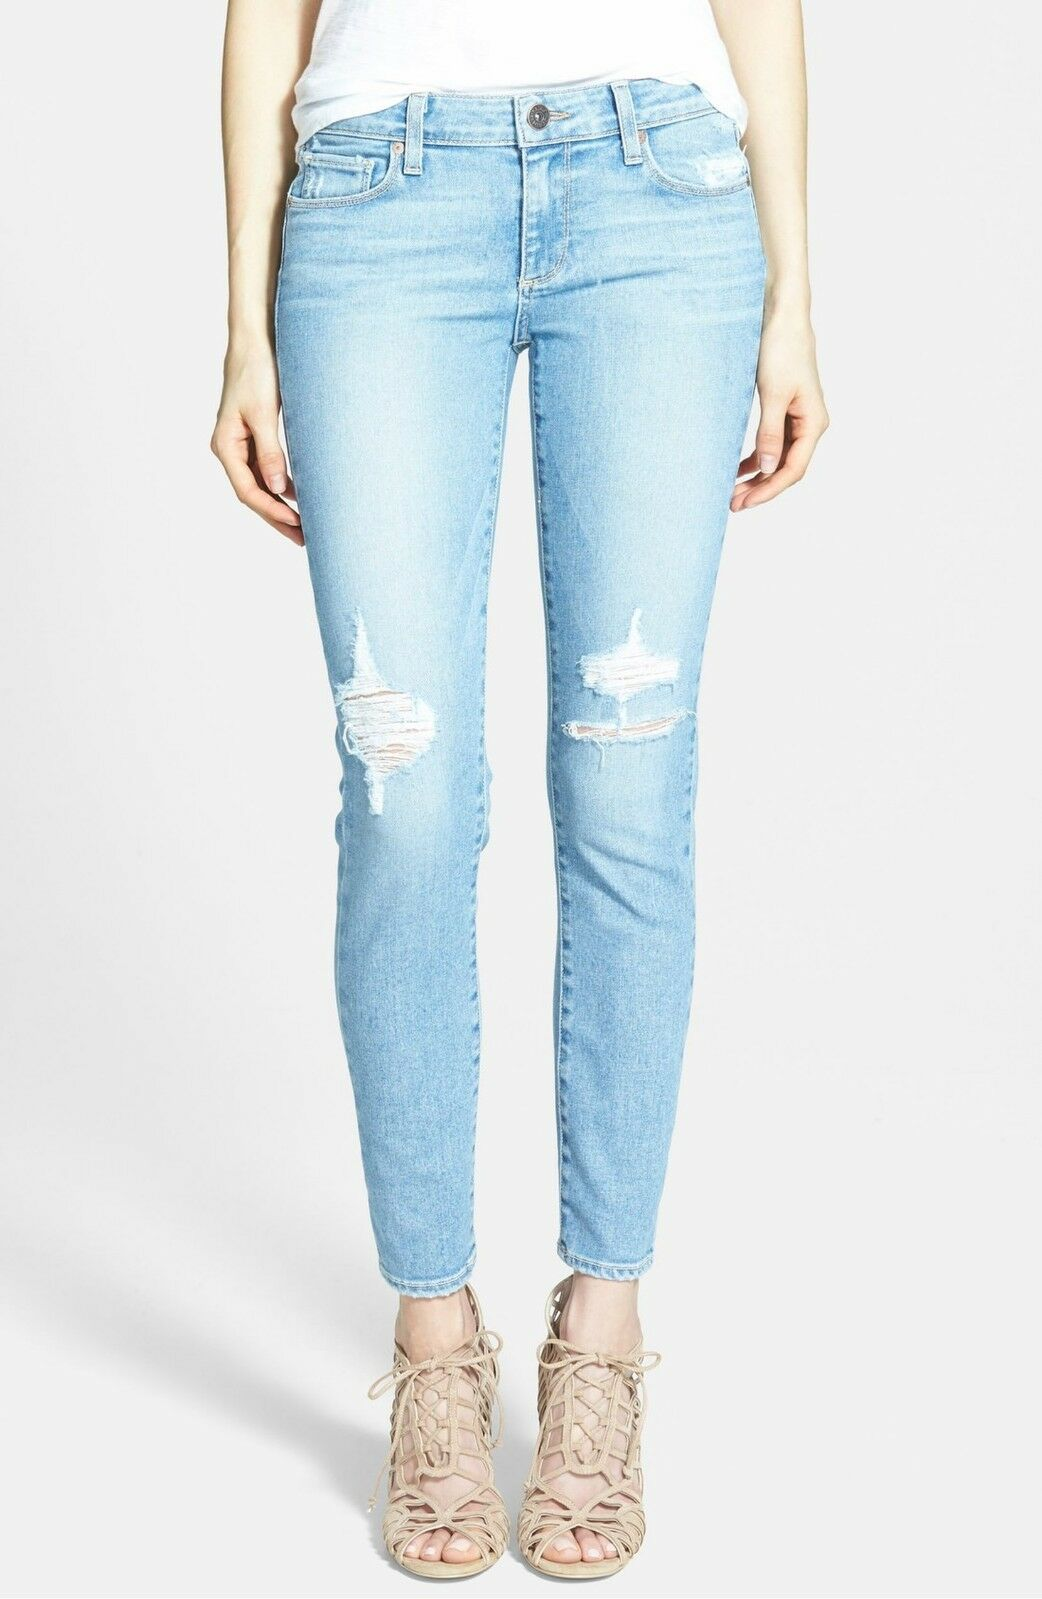 238 Paige Denim Women's SKYLINE ANKLE Peg Jeans in Serena Destructed Sz 29 NWT